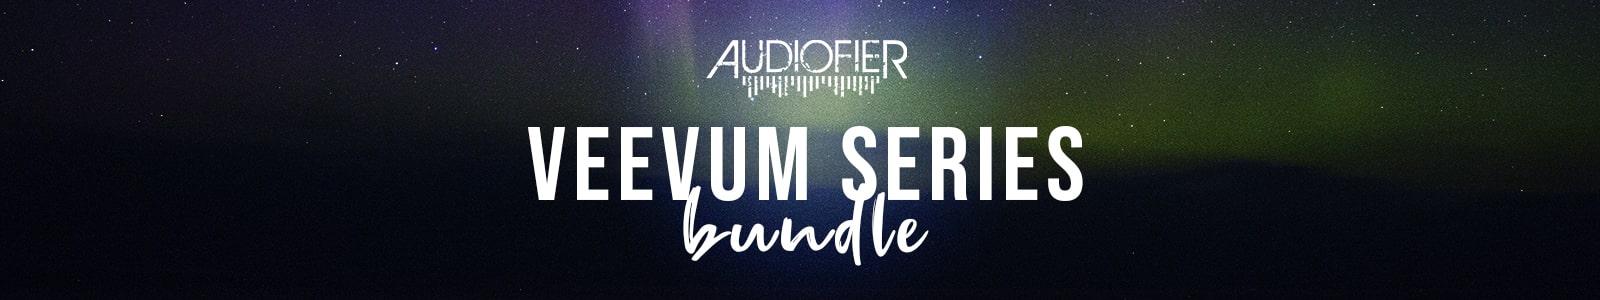 audiofier veevum series bundle